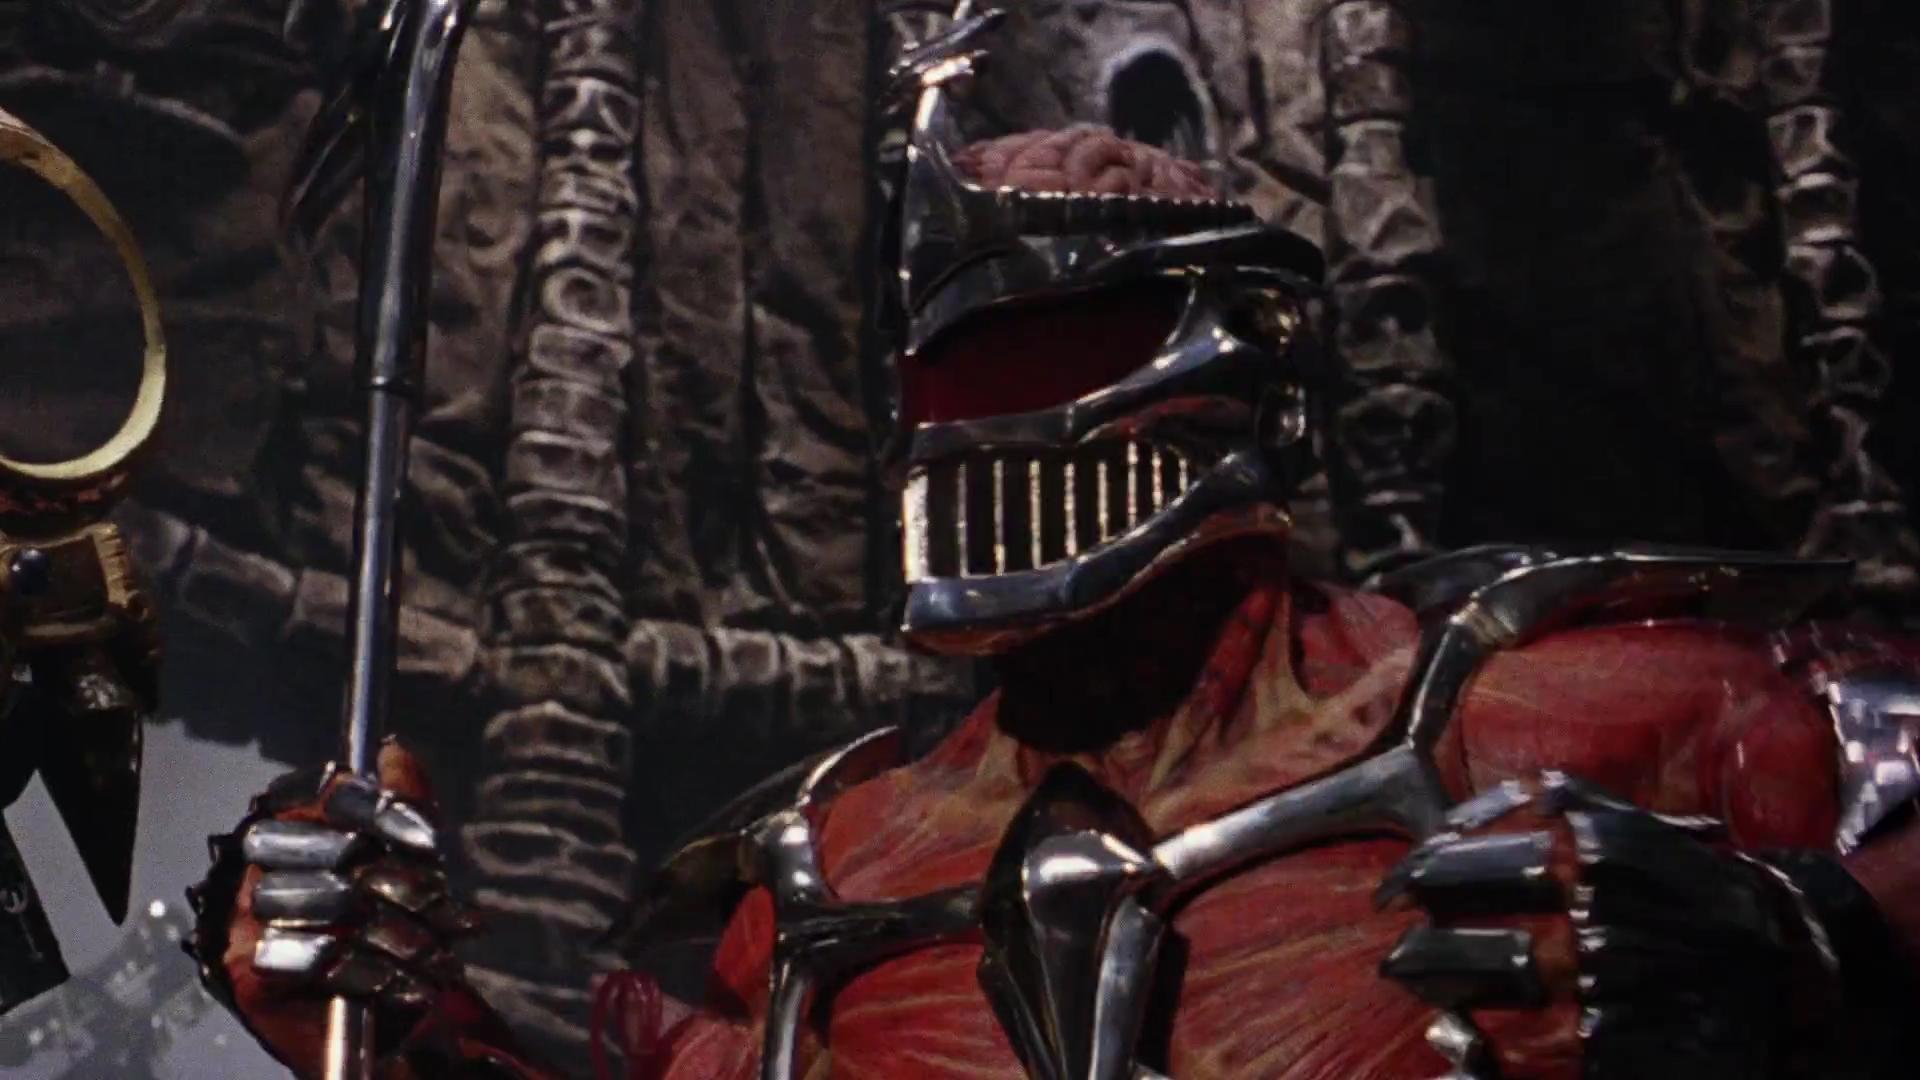 Lord Zedd/1995 movie